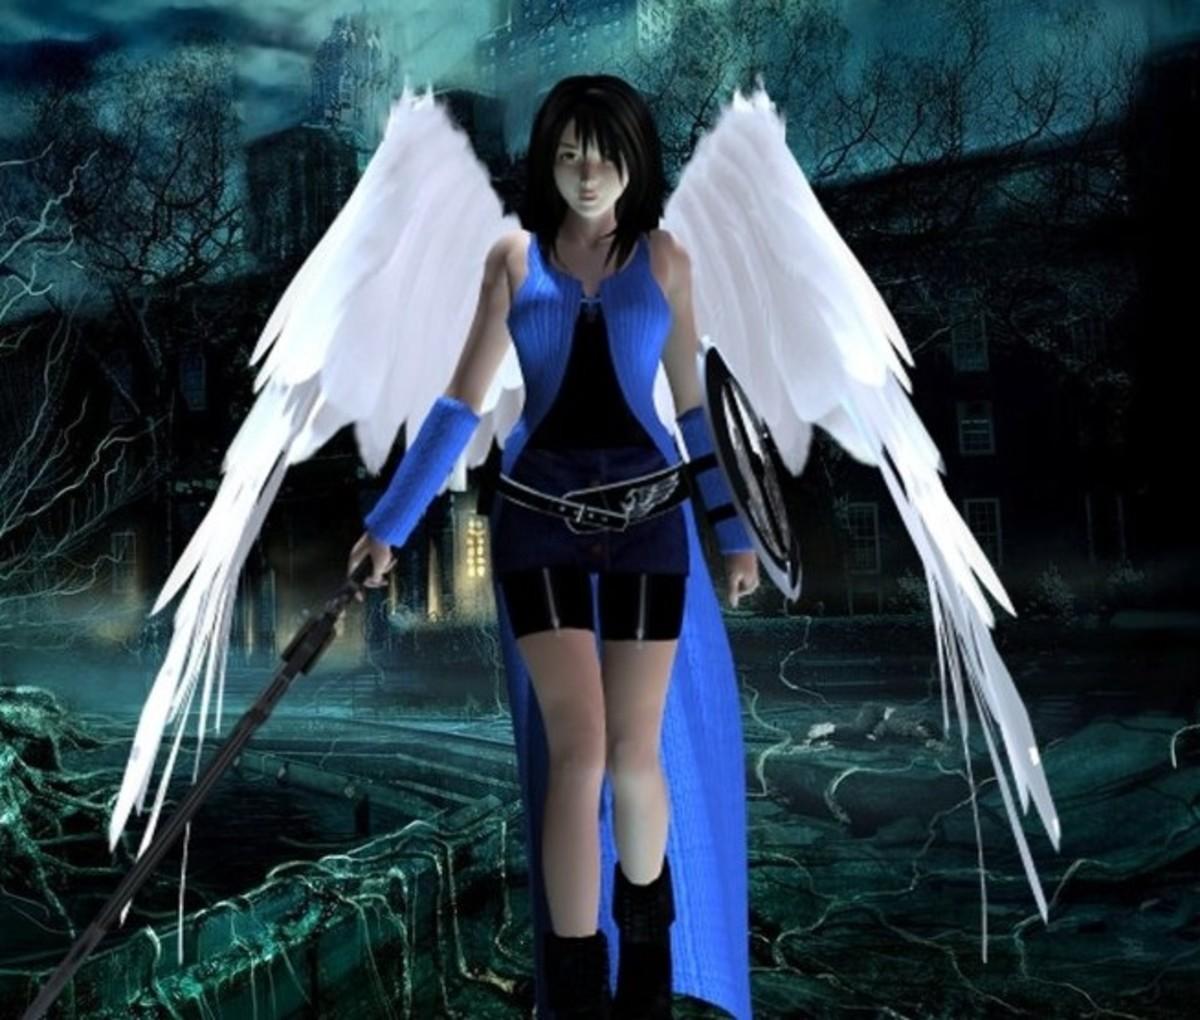 Rinoa's Angel Wing form